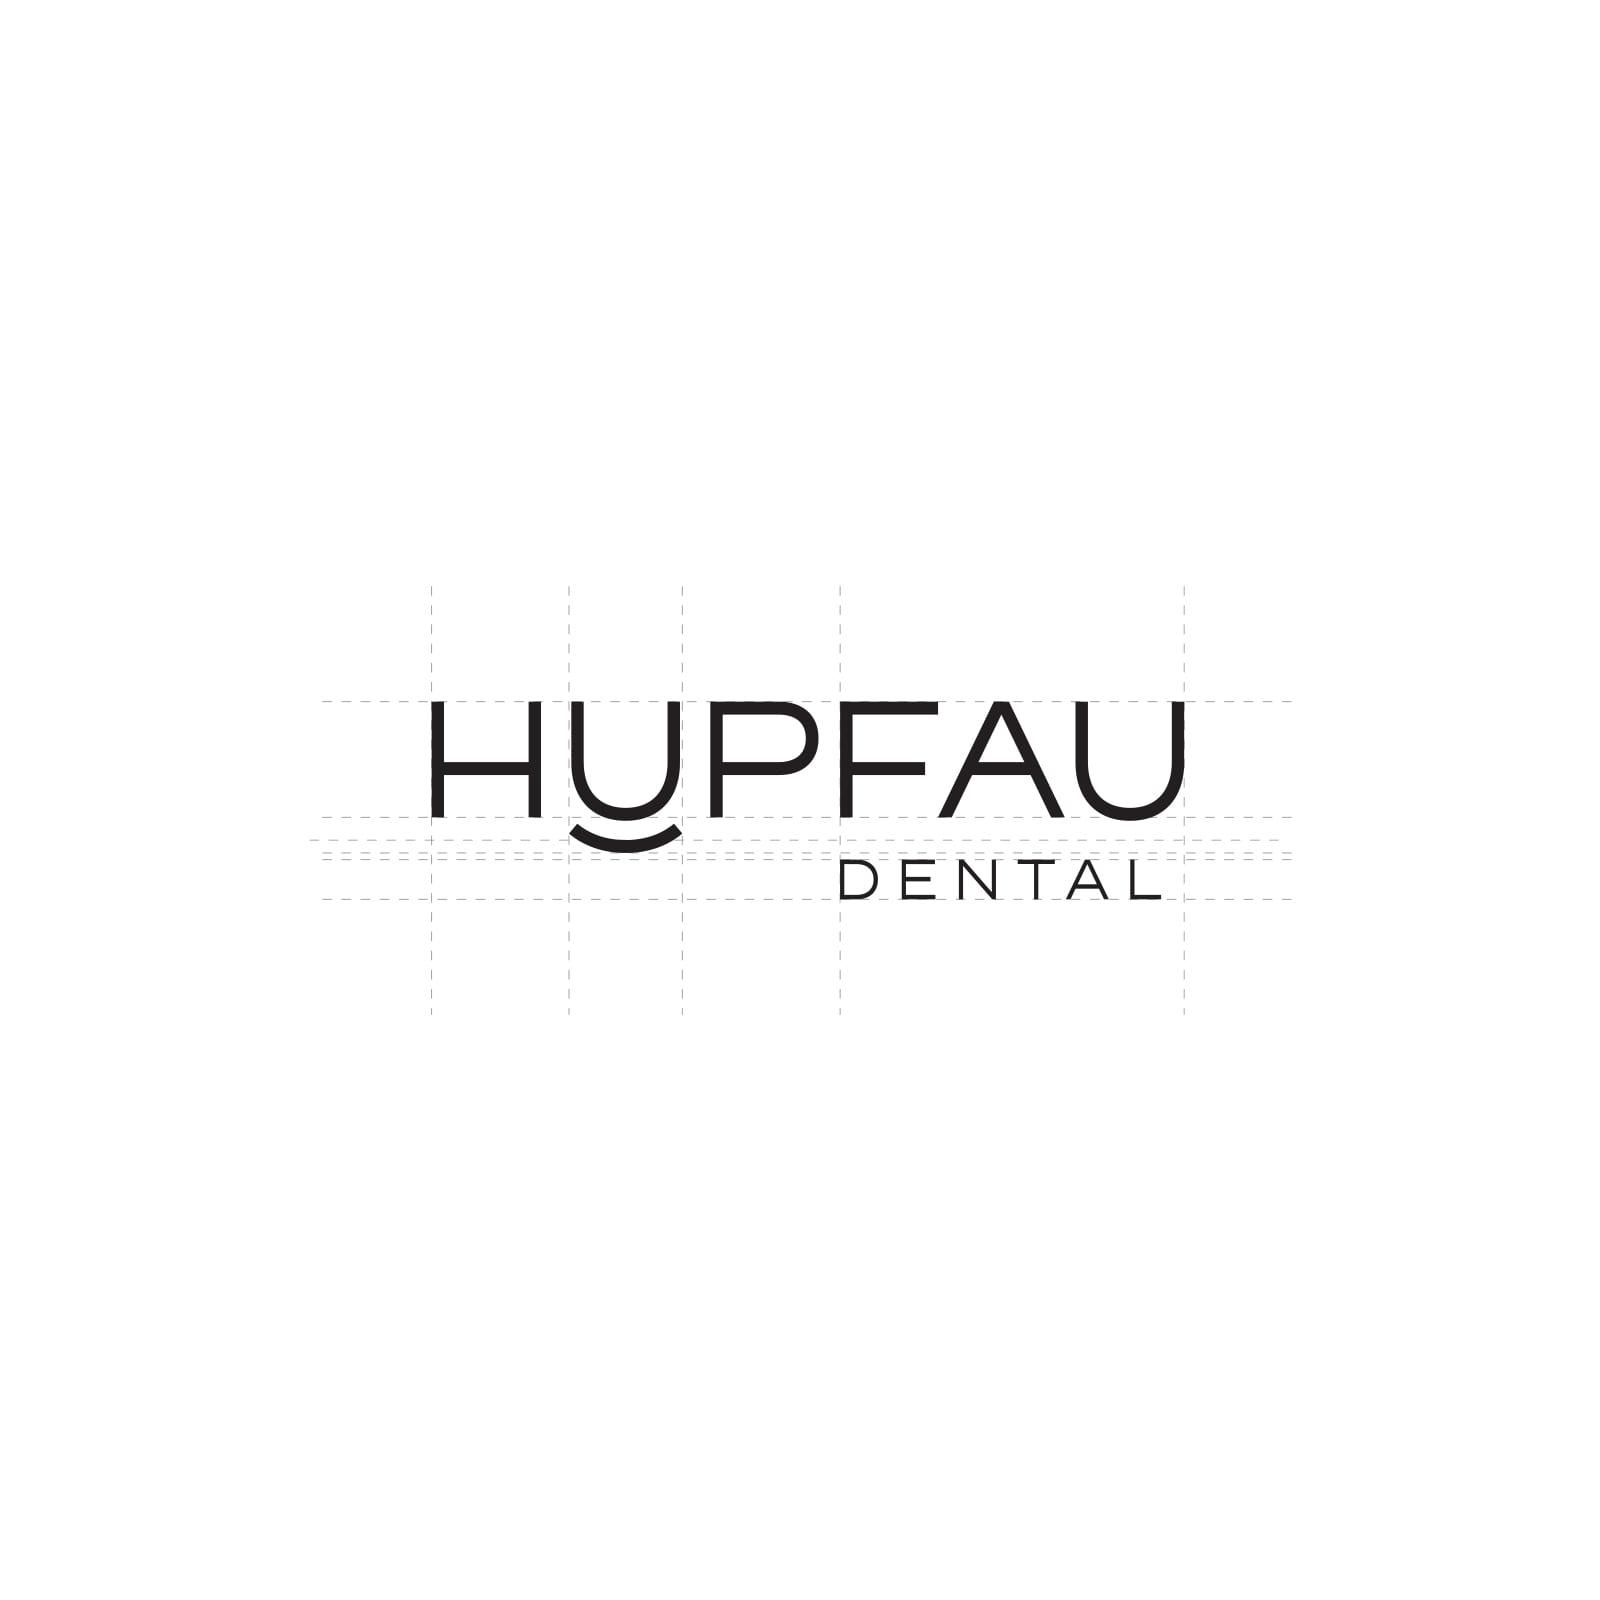 Y5 Creative Case Studies Hupfau Dental Work Process 1